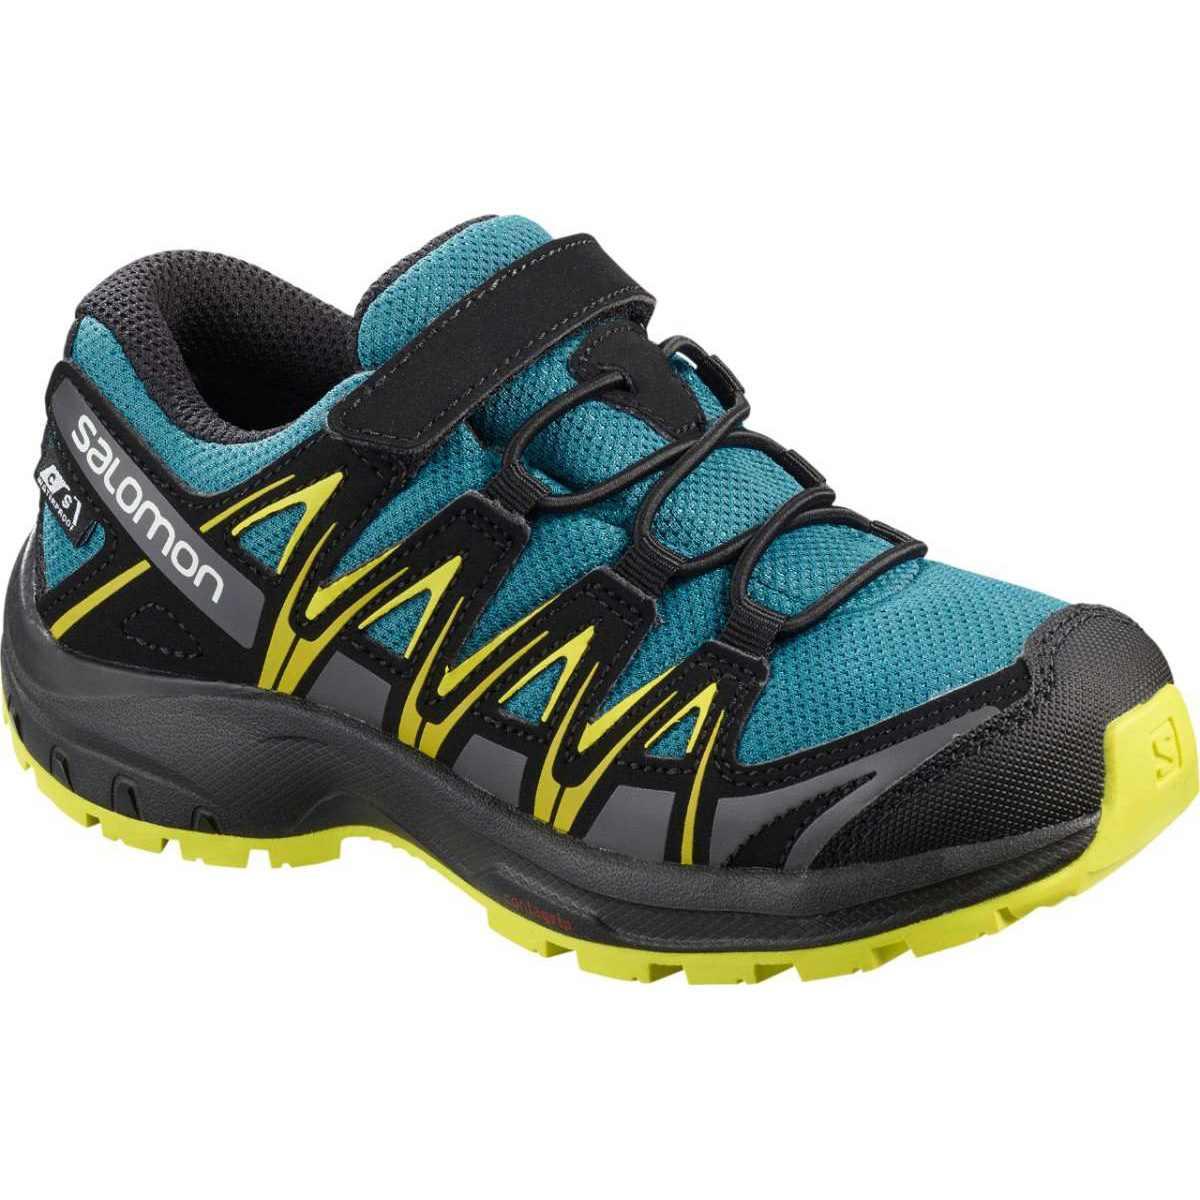 Pantofi alergare Salomon XA PRO 3D CSWP K - Albastru